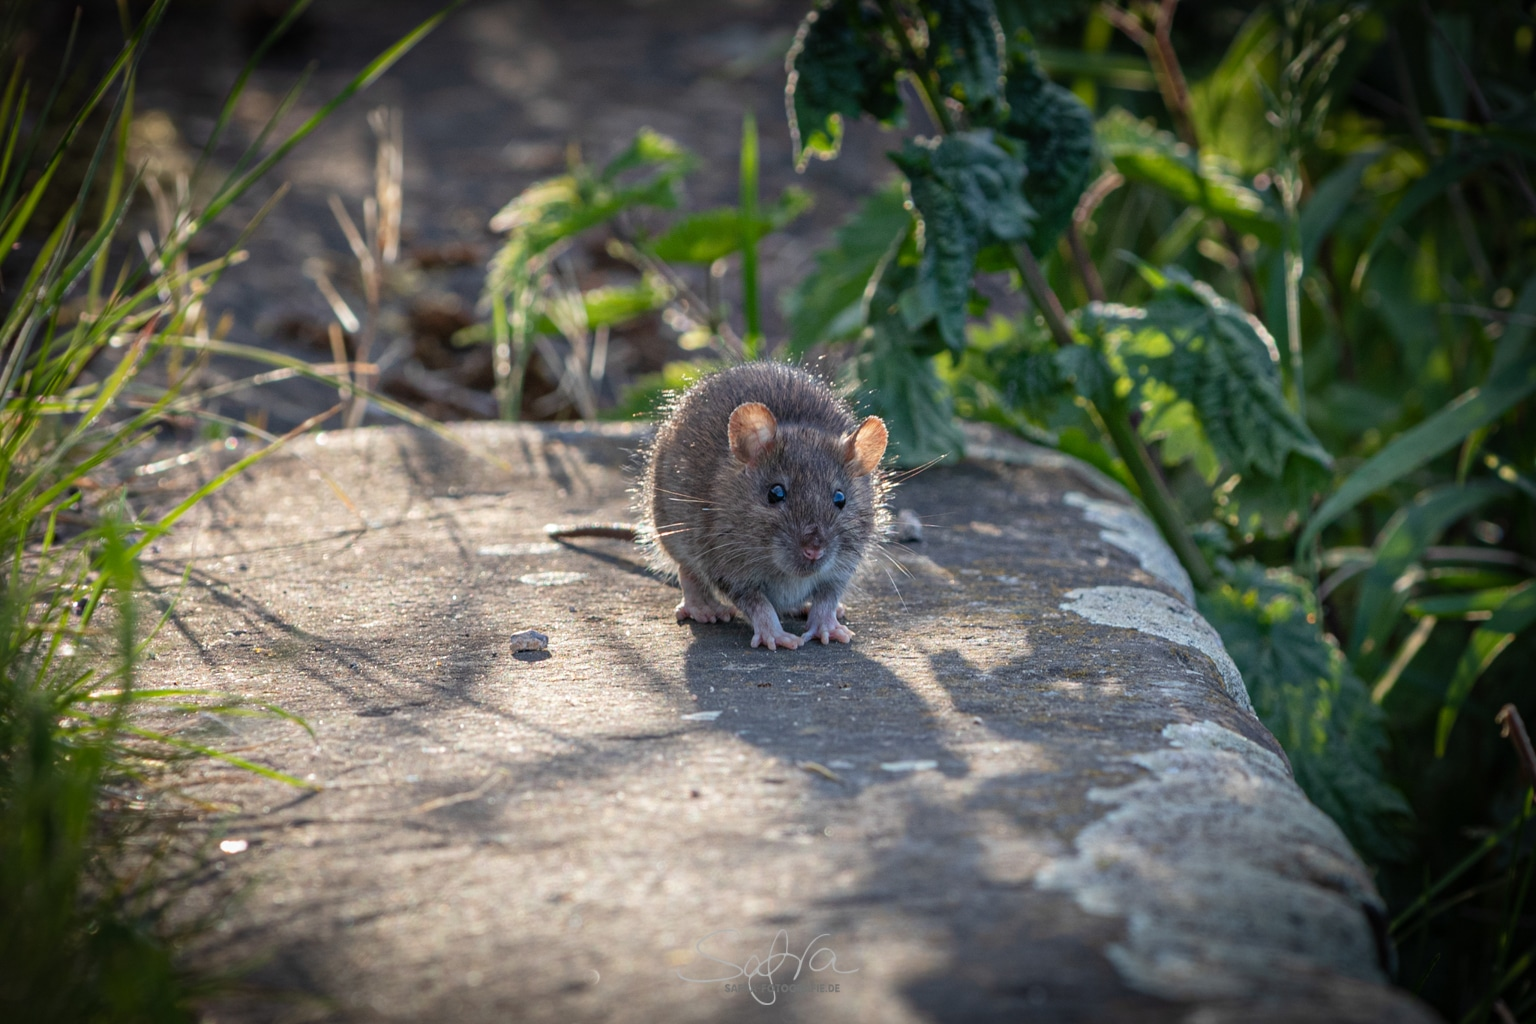 Wilde Maus in Seligenstadt am Main